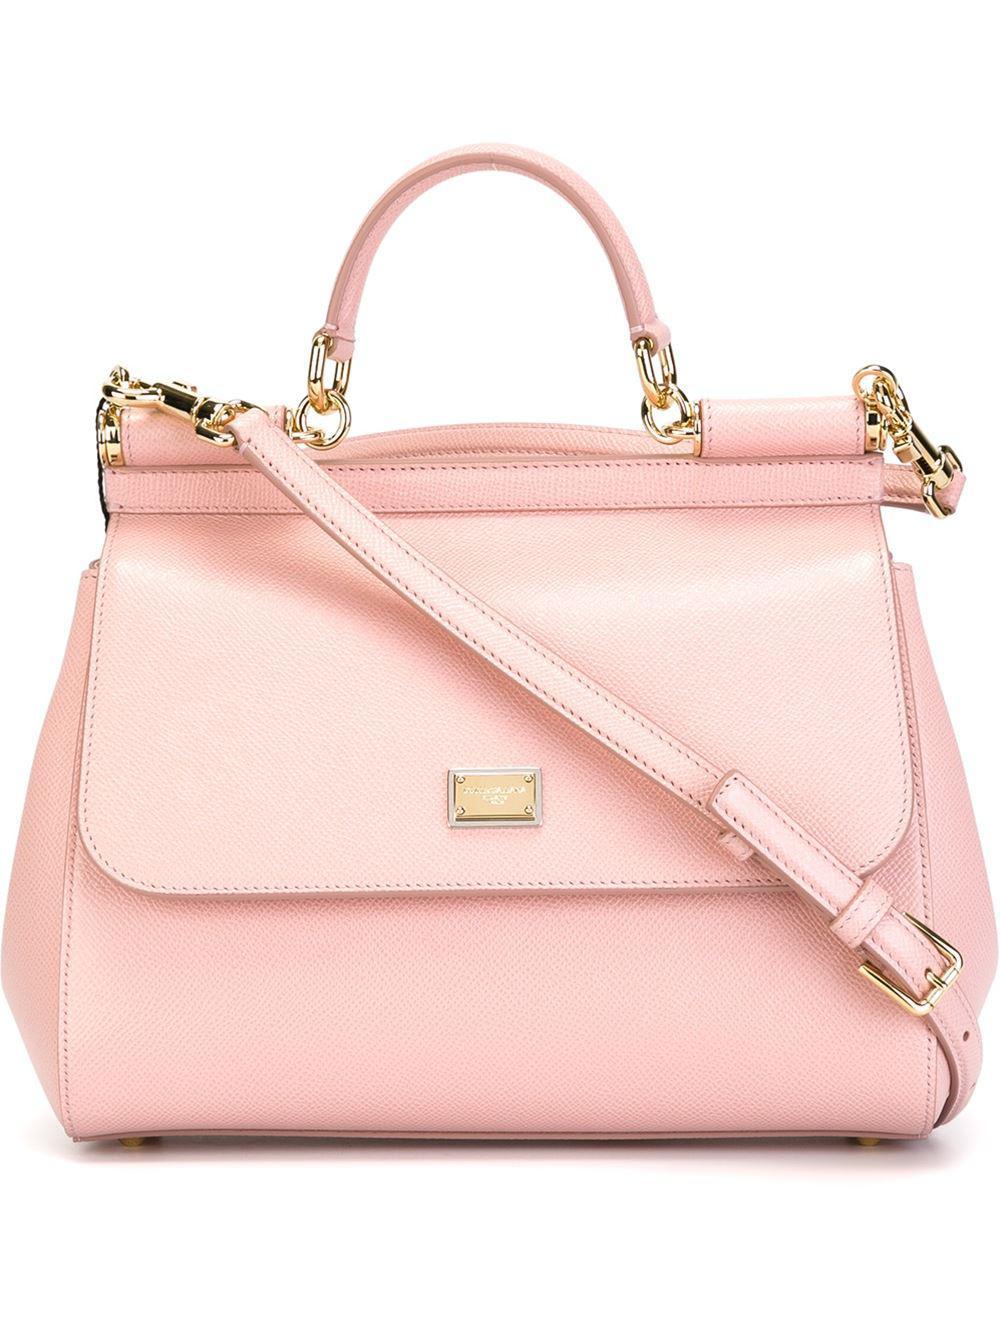 Dolce   Gabbana St.dauphine Handbag in Pink - Lyst 2d308307538be